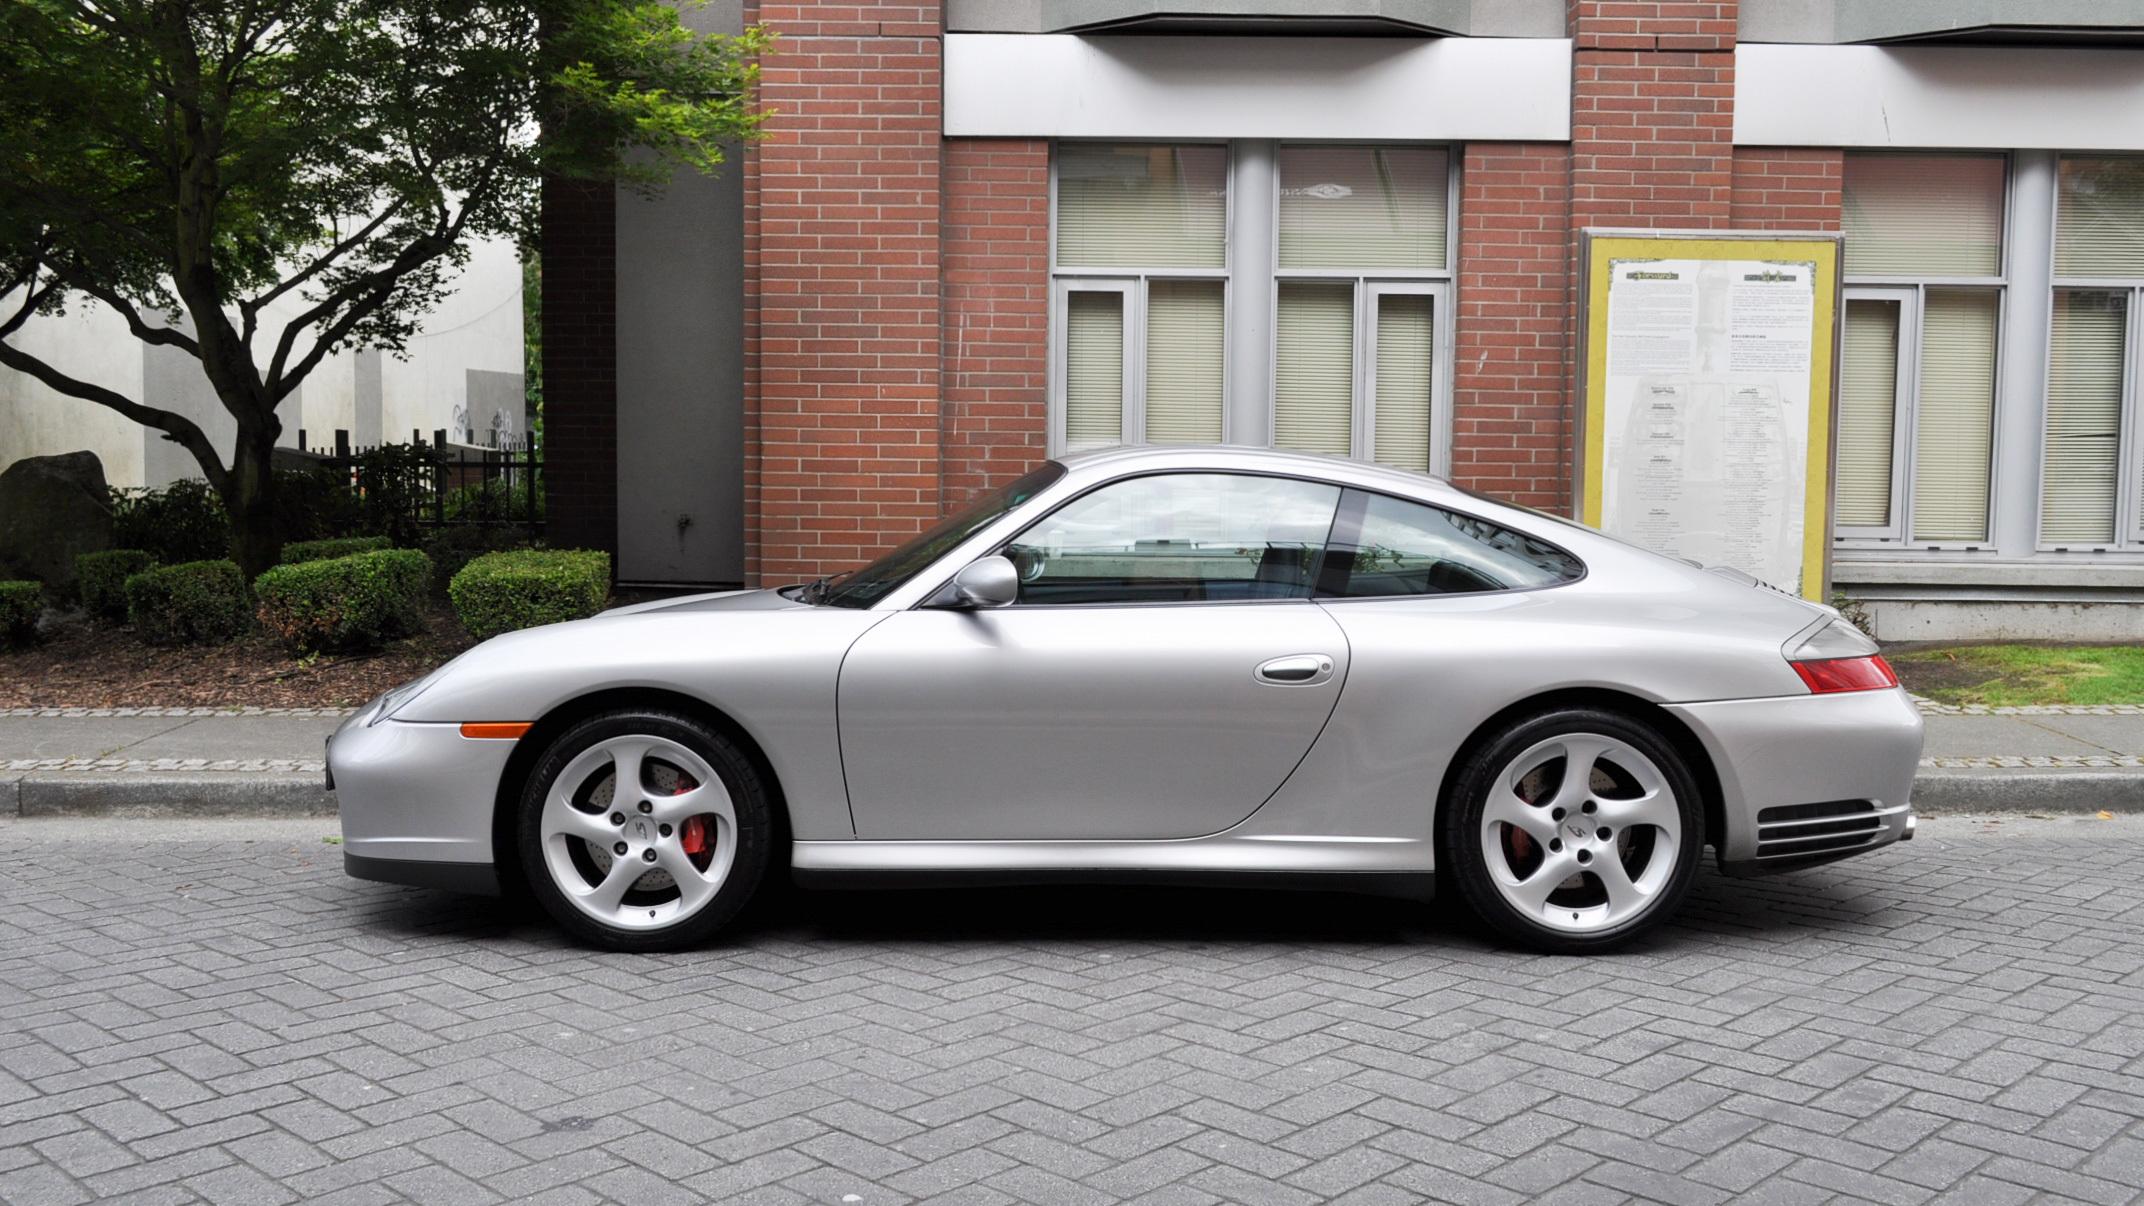 2002 porsche 911 carrera 4s autoform. Black Bedroom Furniture Sets. Home Design Ideas